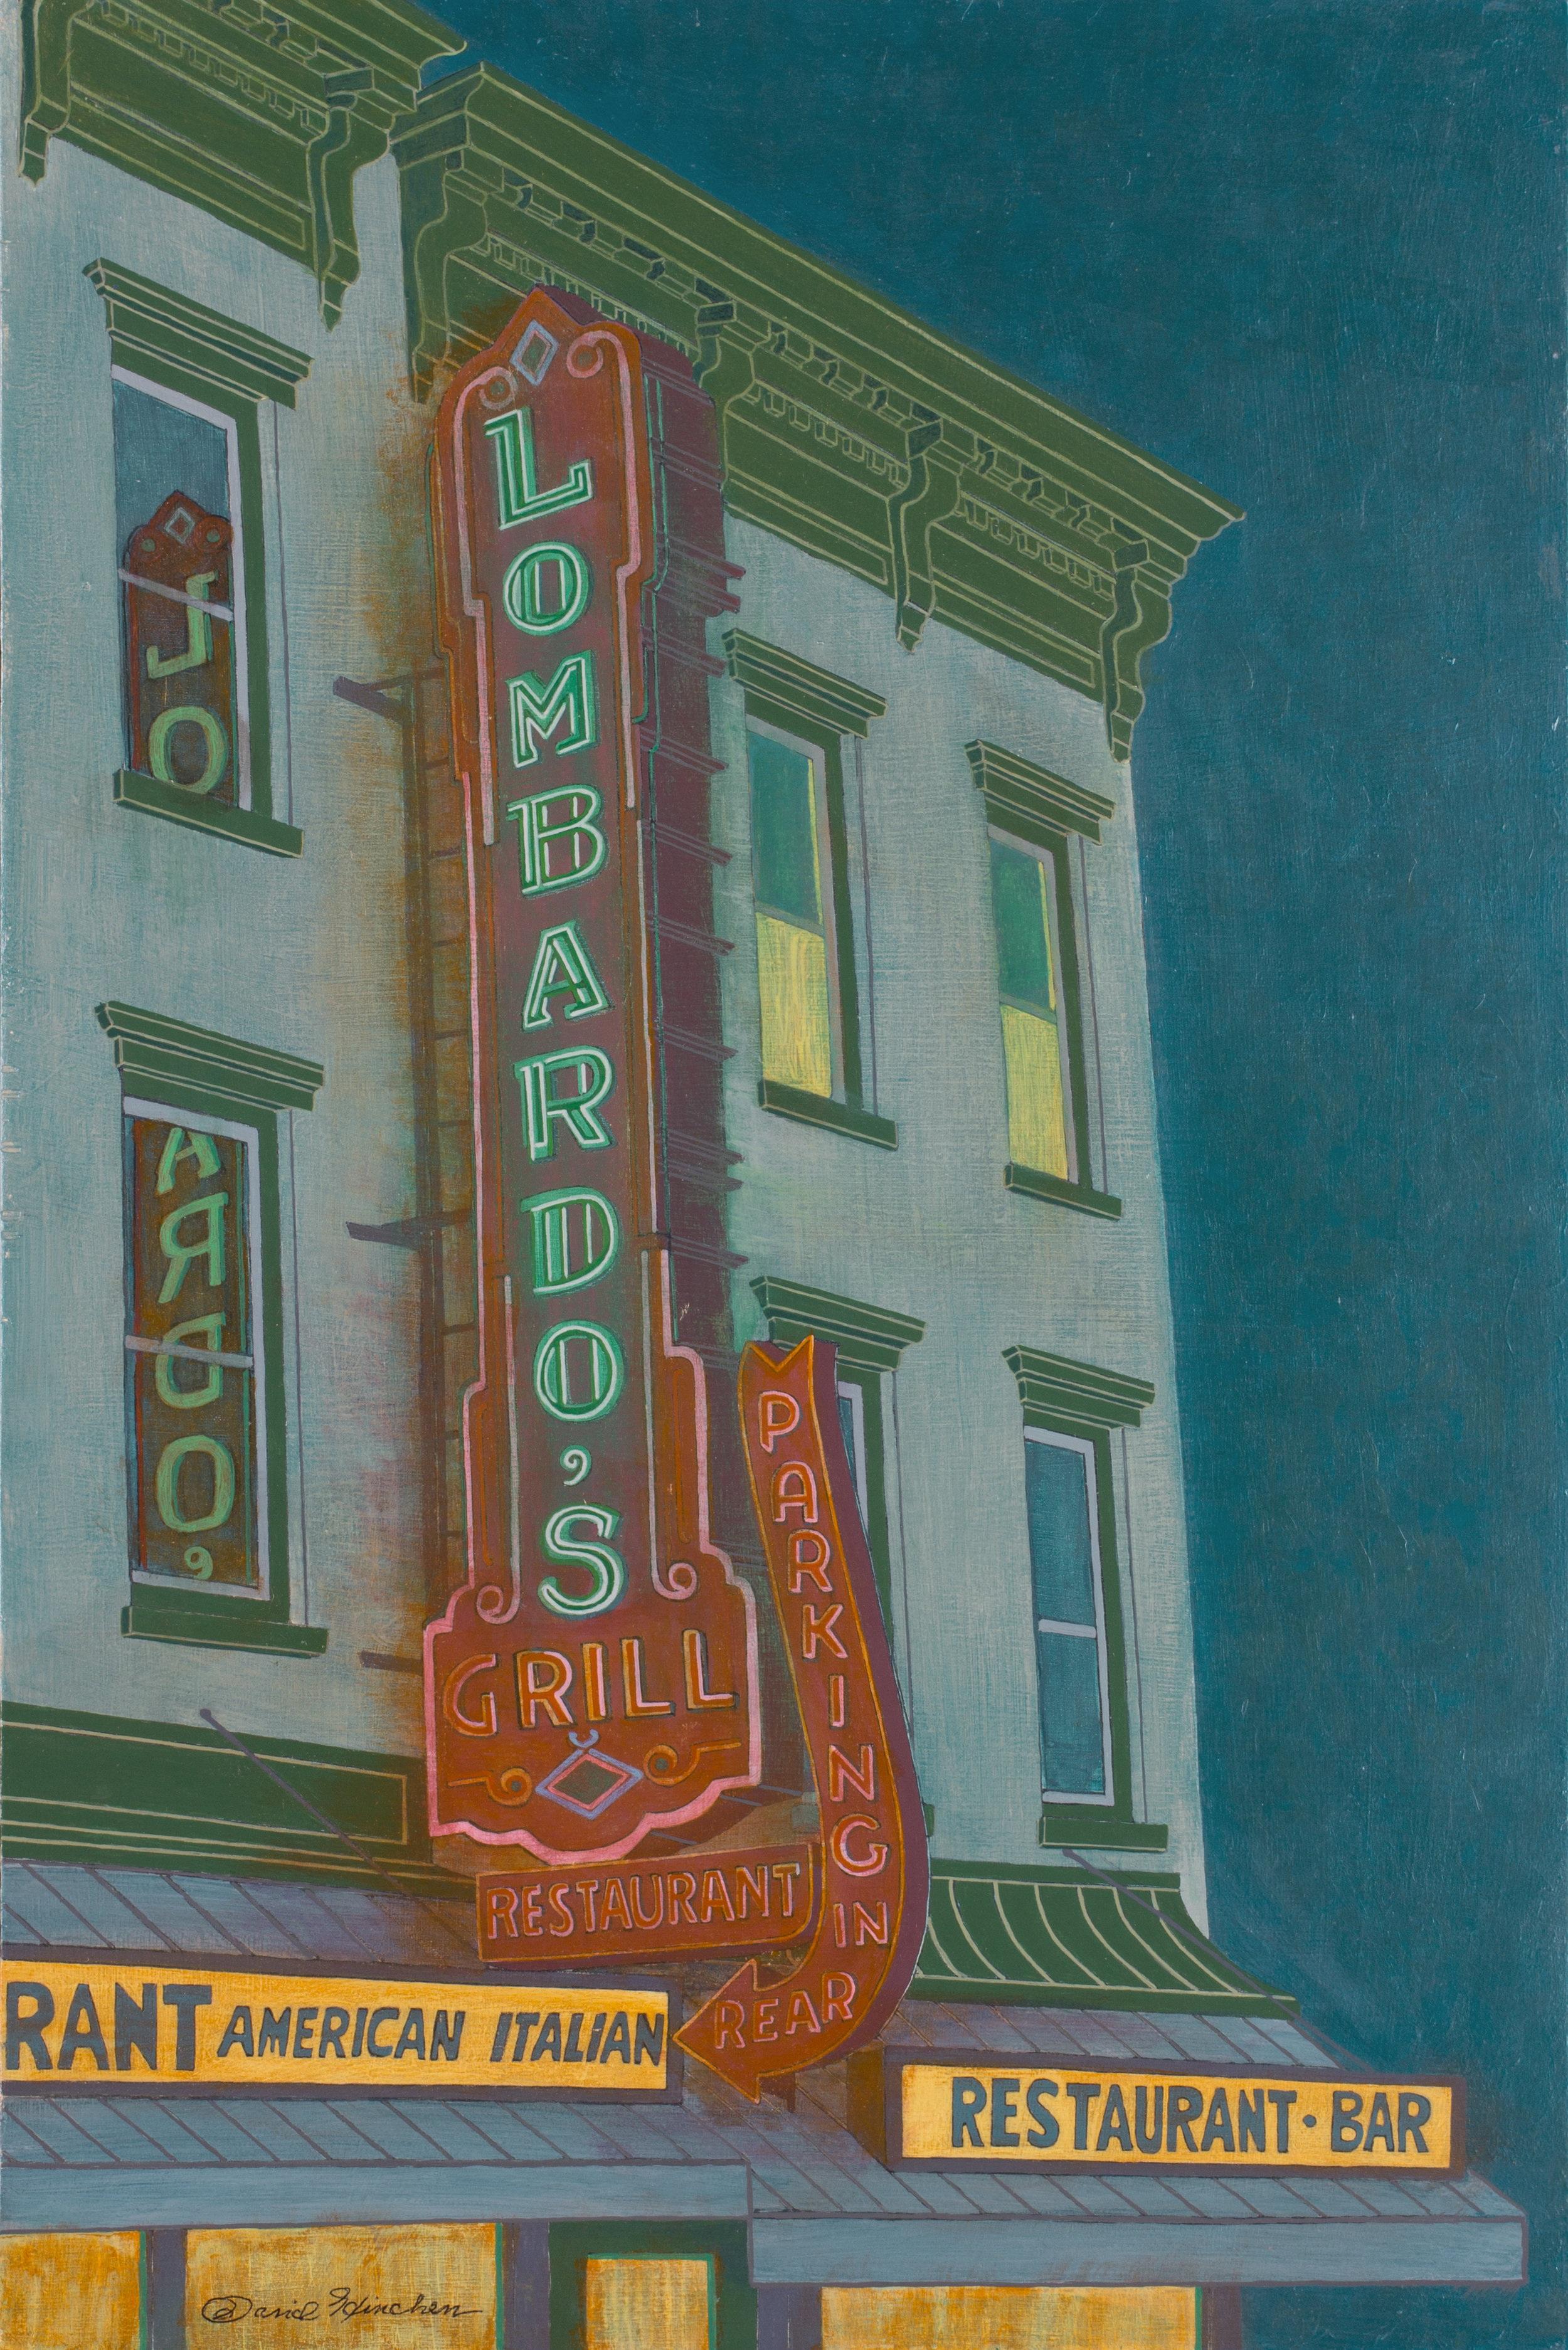 Lombardo's